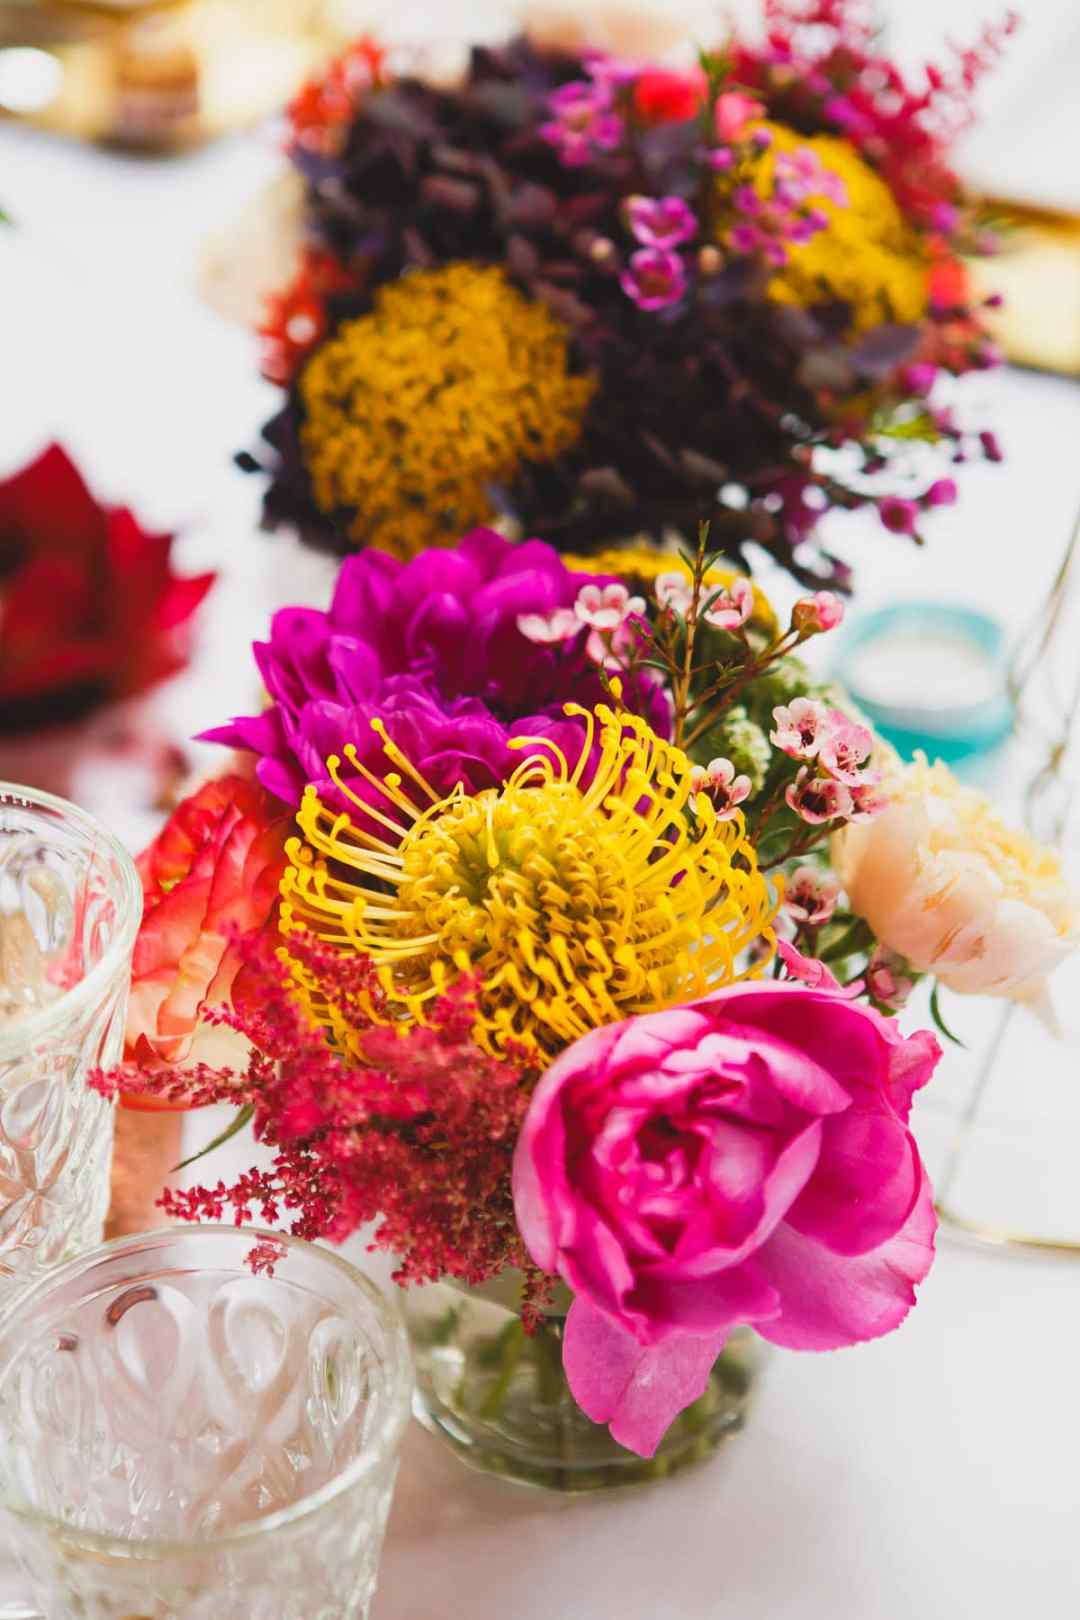 lieu-reception-colore-vitamine-punchy-exotique-mariage